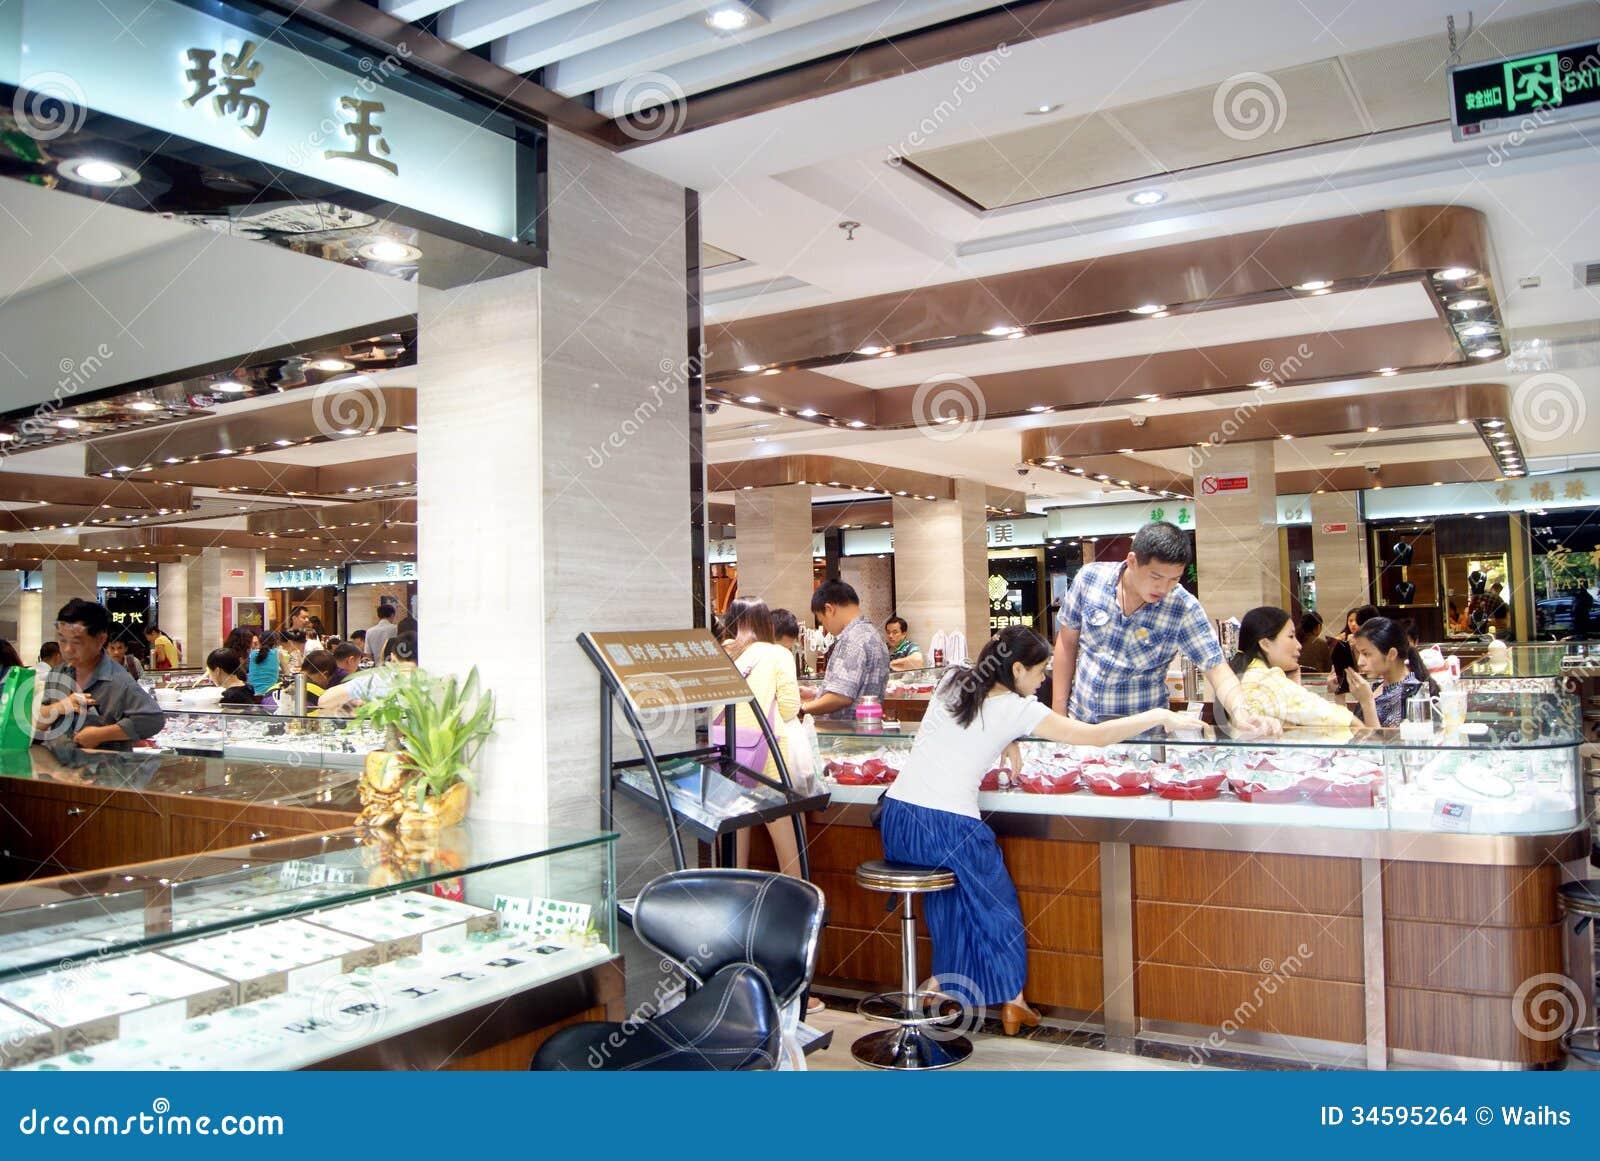 shenzhen china jewelry store editorial stock image